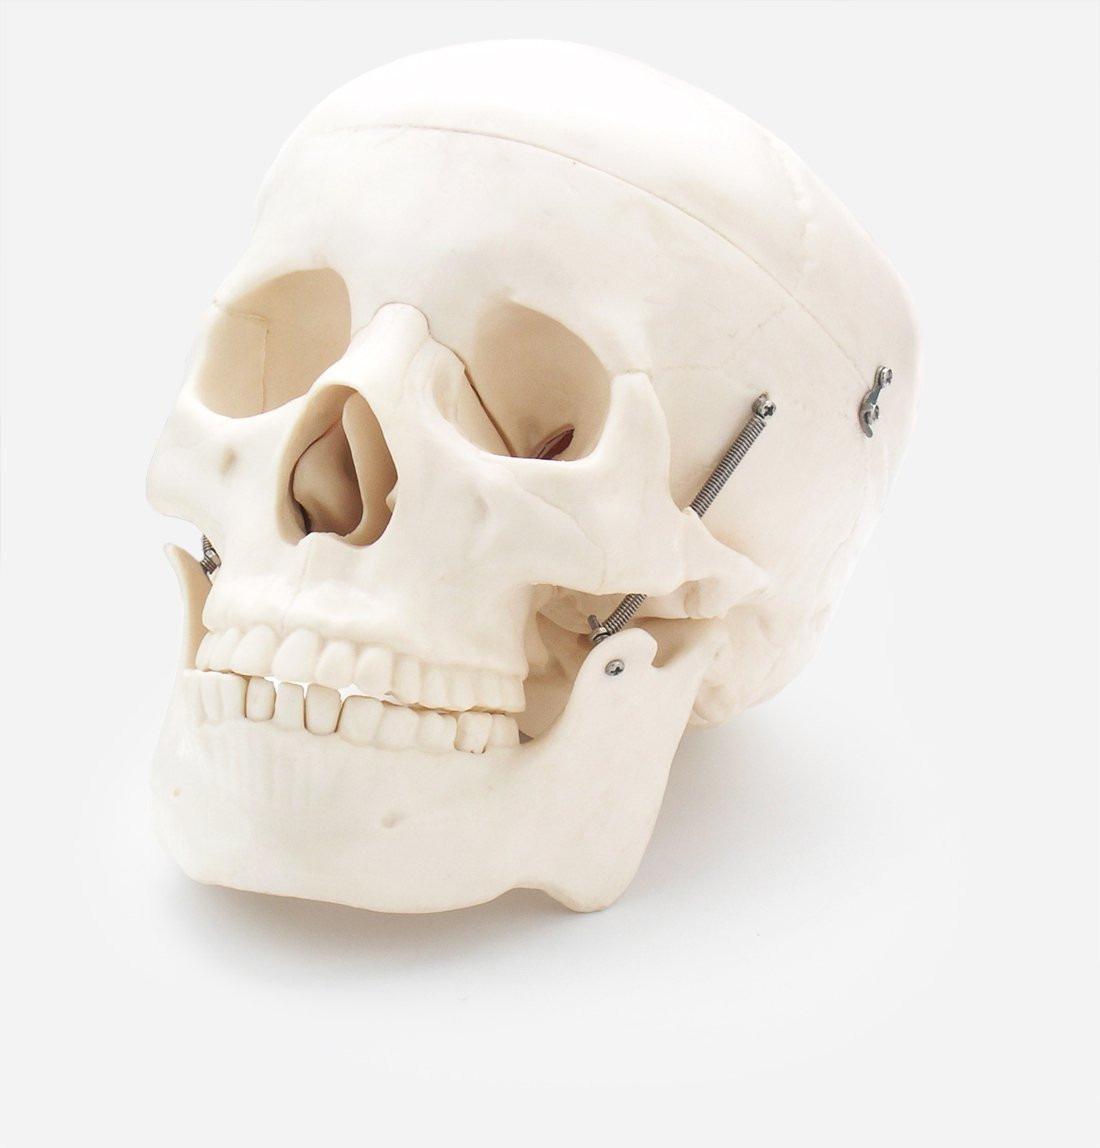 Craneo Humano Medicina Anatomia Kinesiologia Osteopatia - $ 999,99 ...